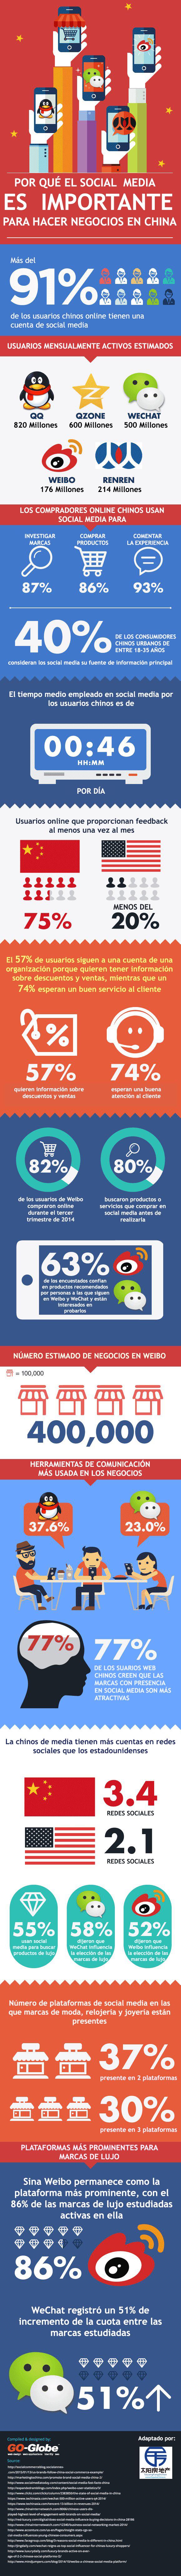 infografía social media marcas de lujo china